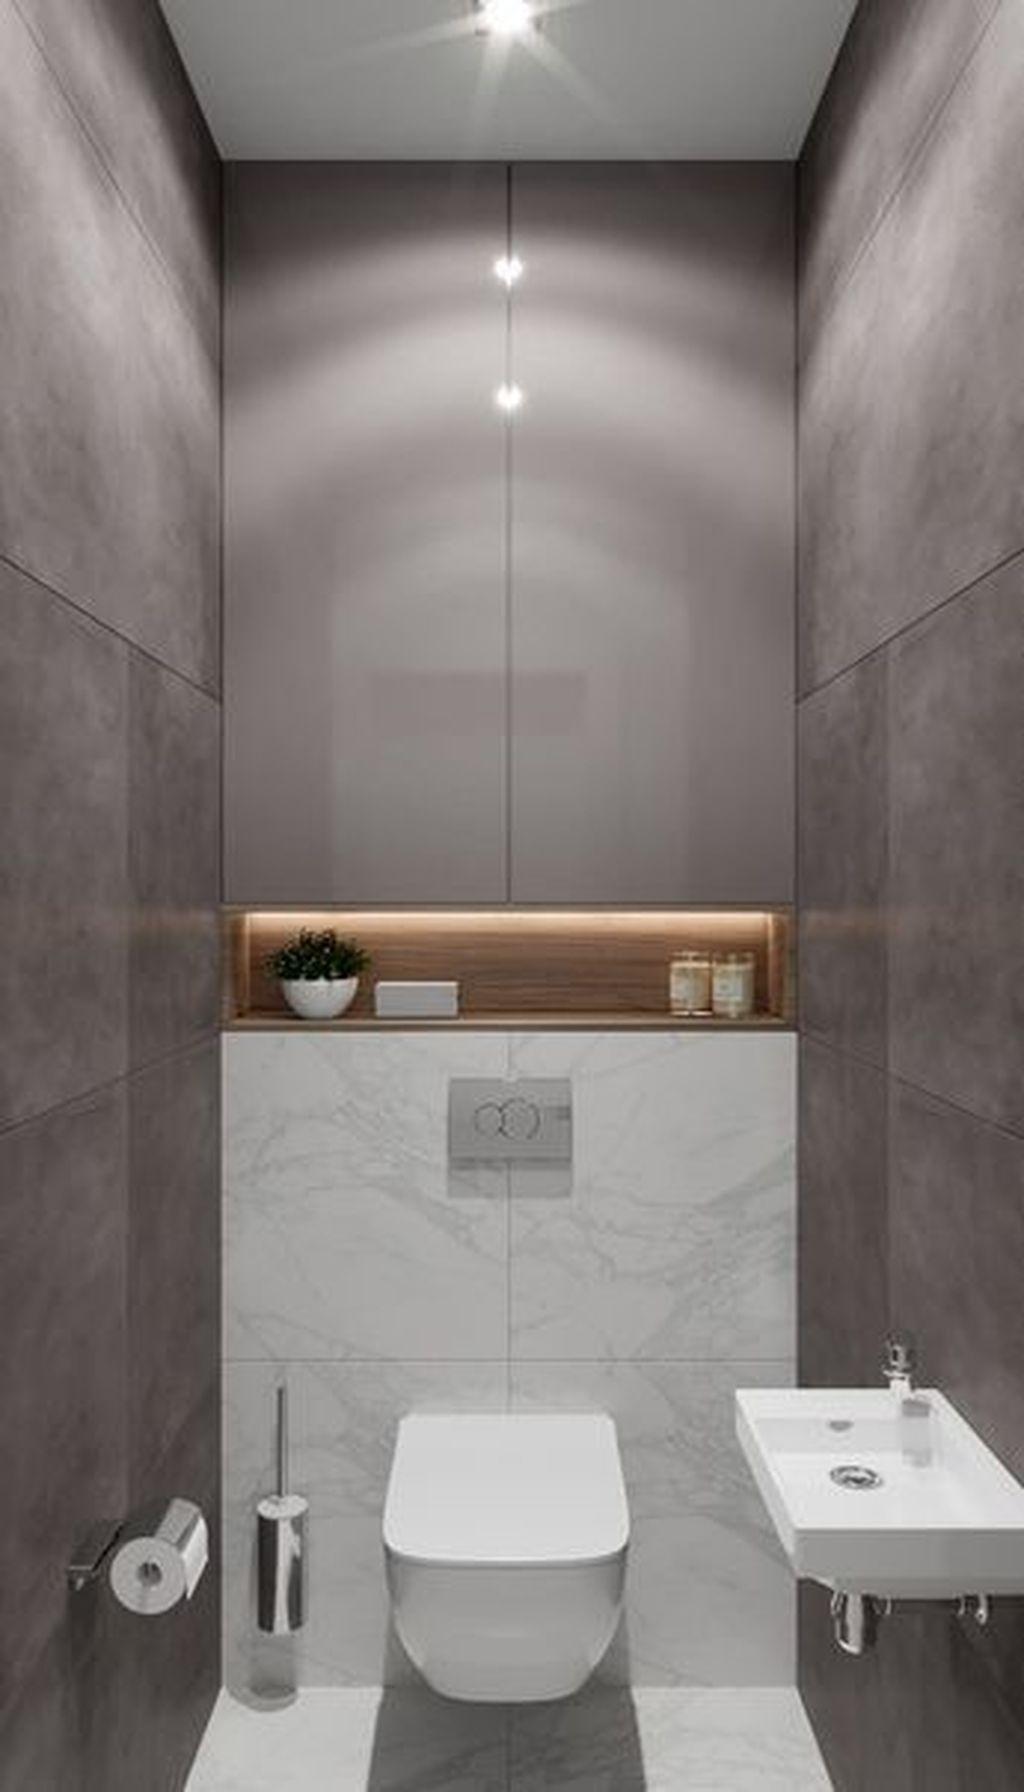 Unusual Bathroom Design Ideas You Need To Know 04